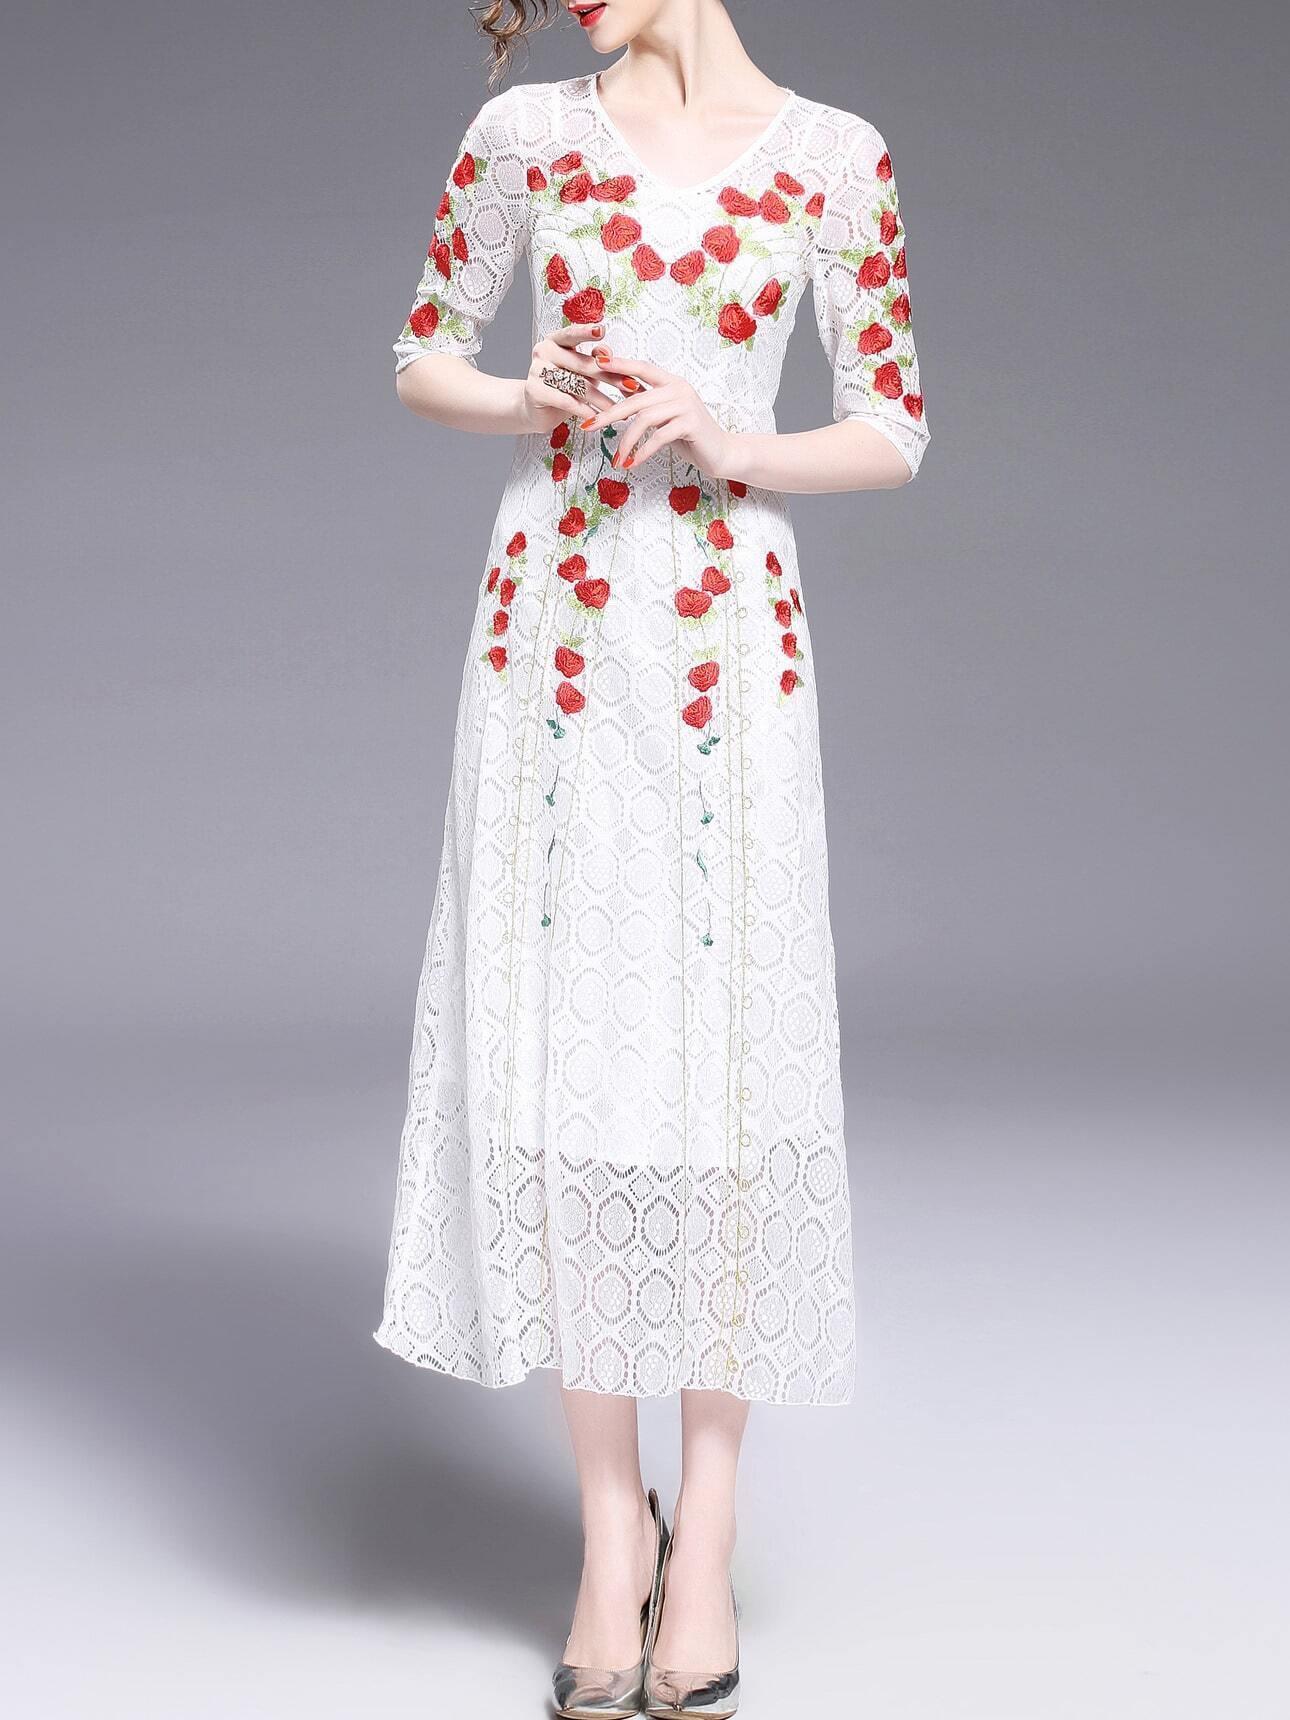 V neck rose embroidered lace dress shein sheinside